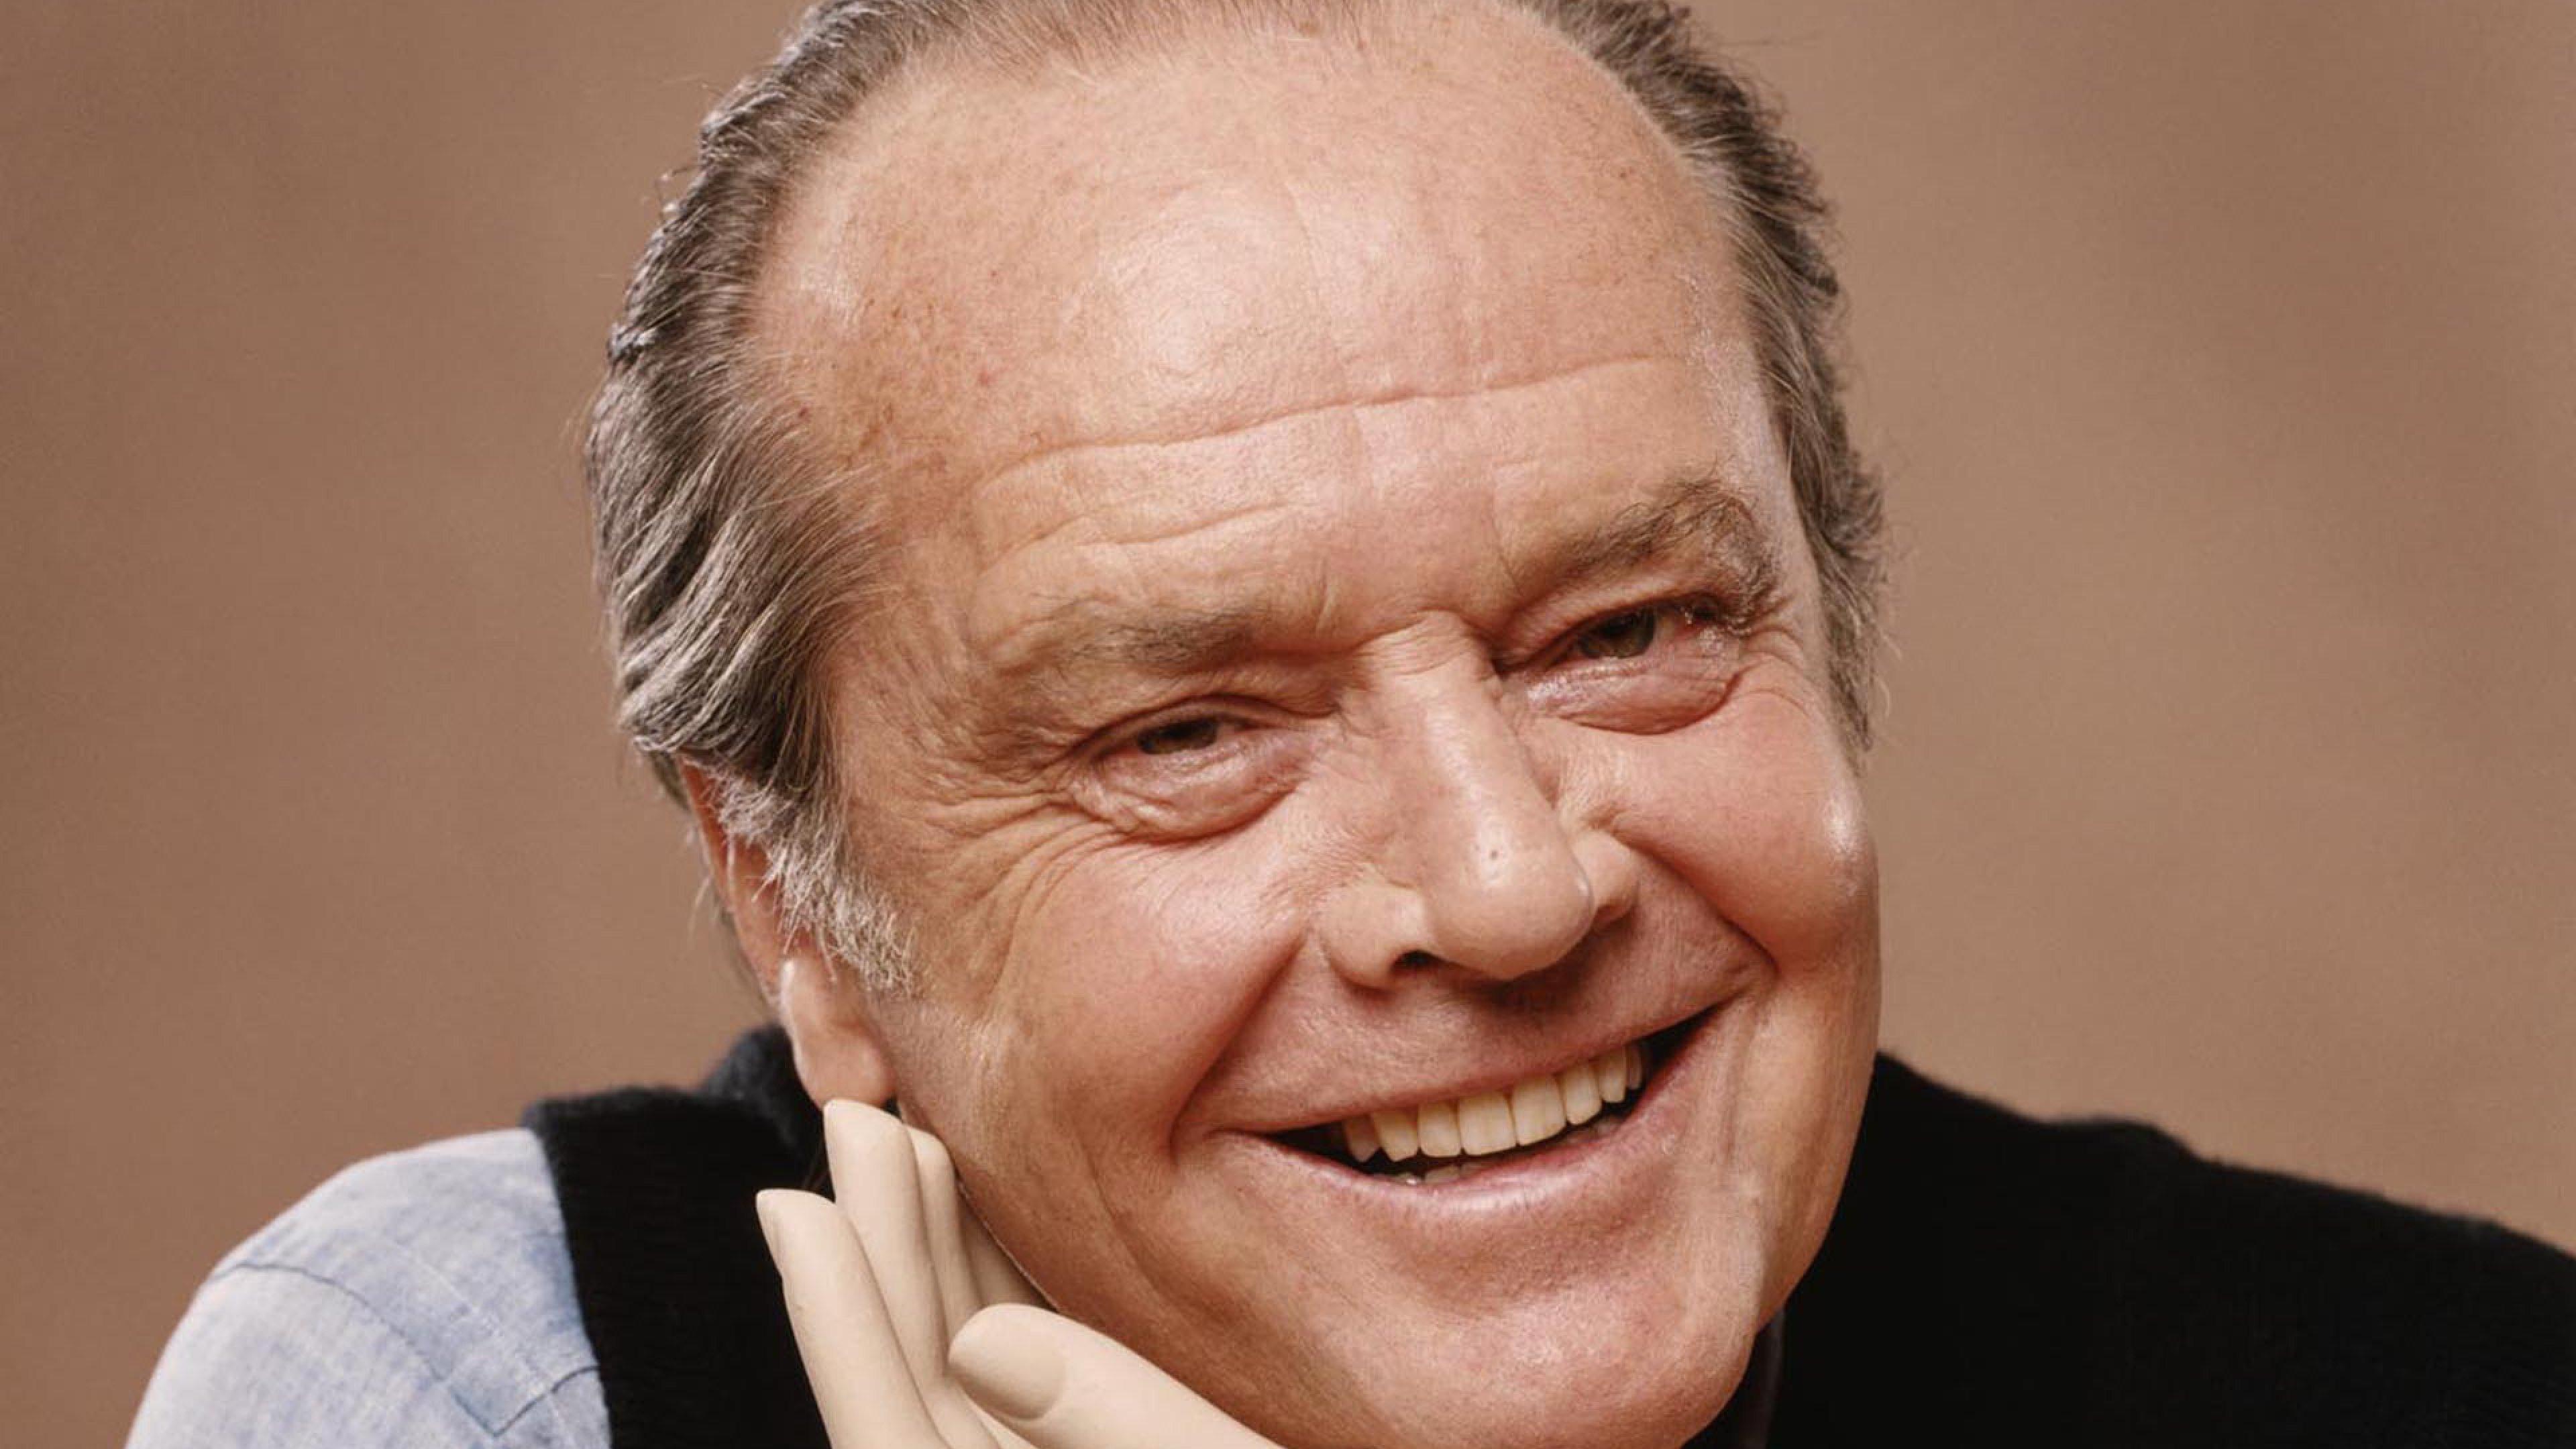 Jack Nicholson Wallpaper